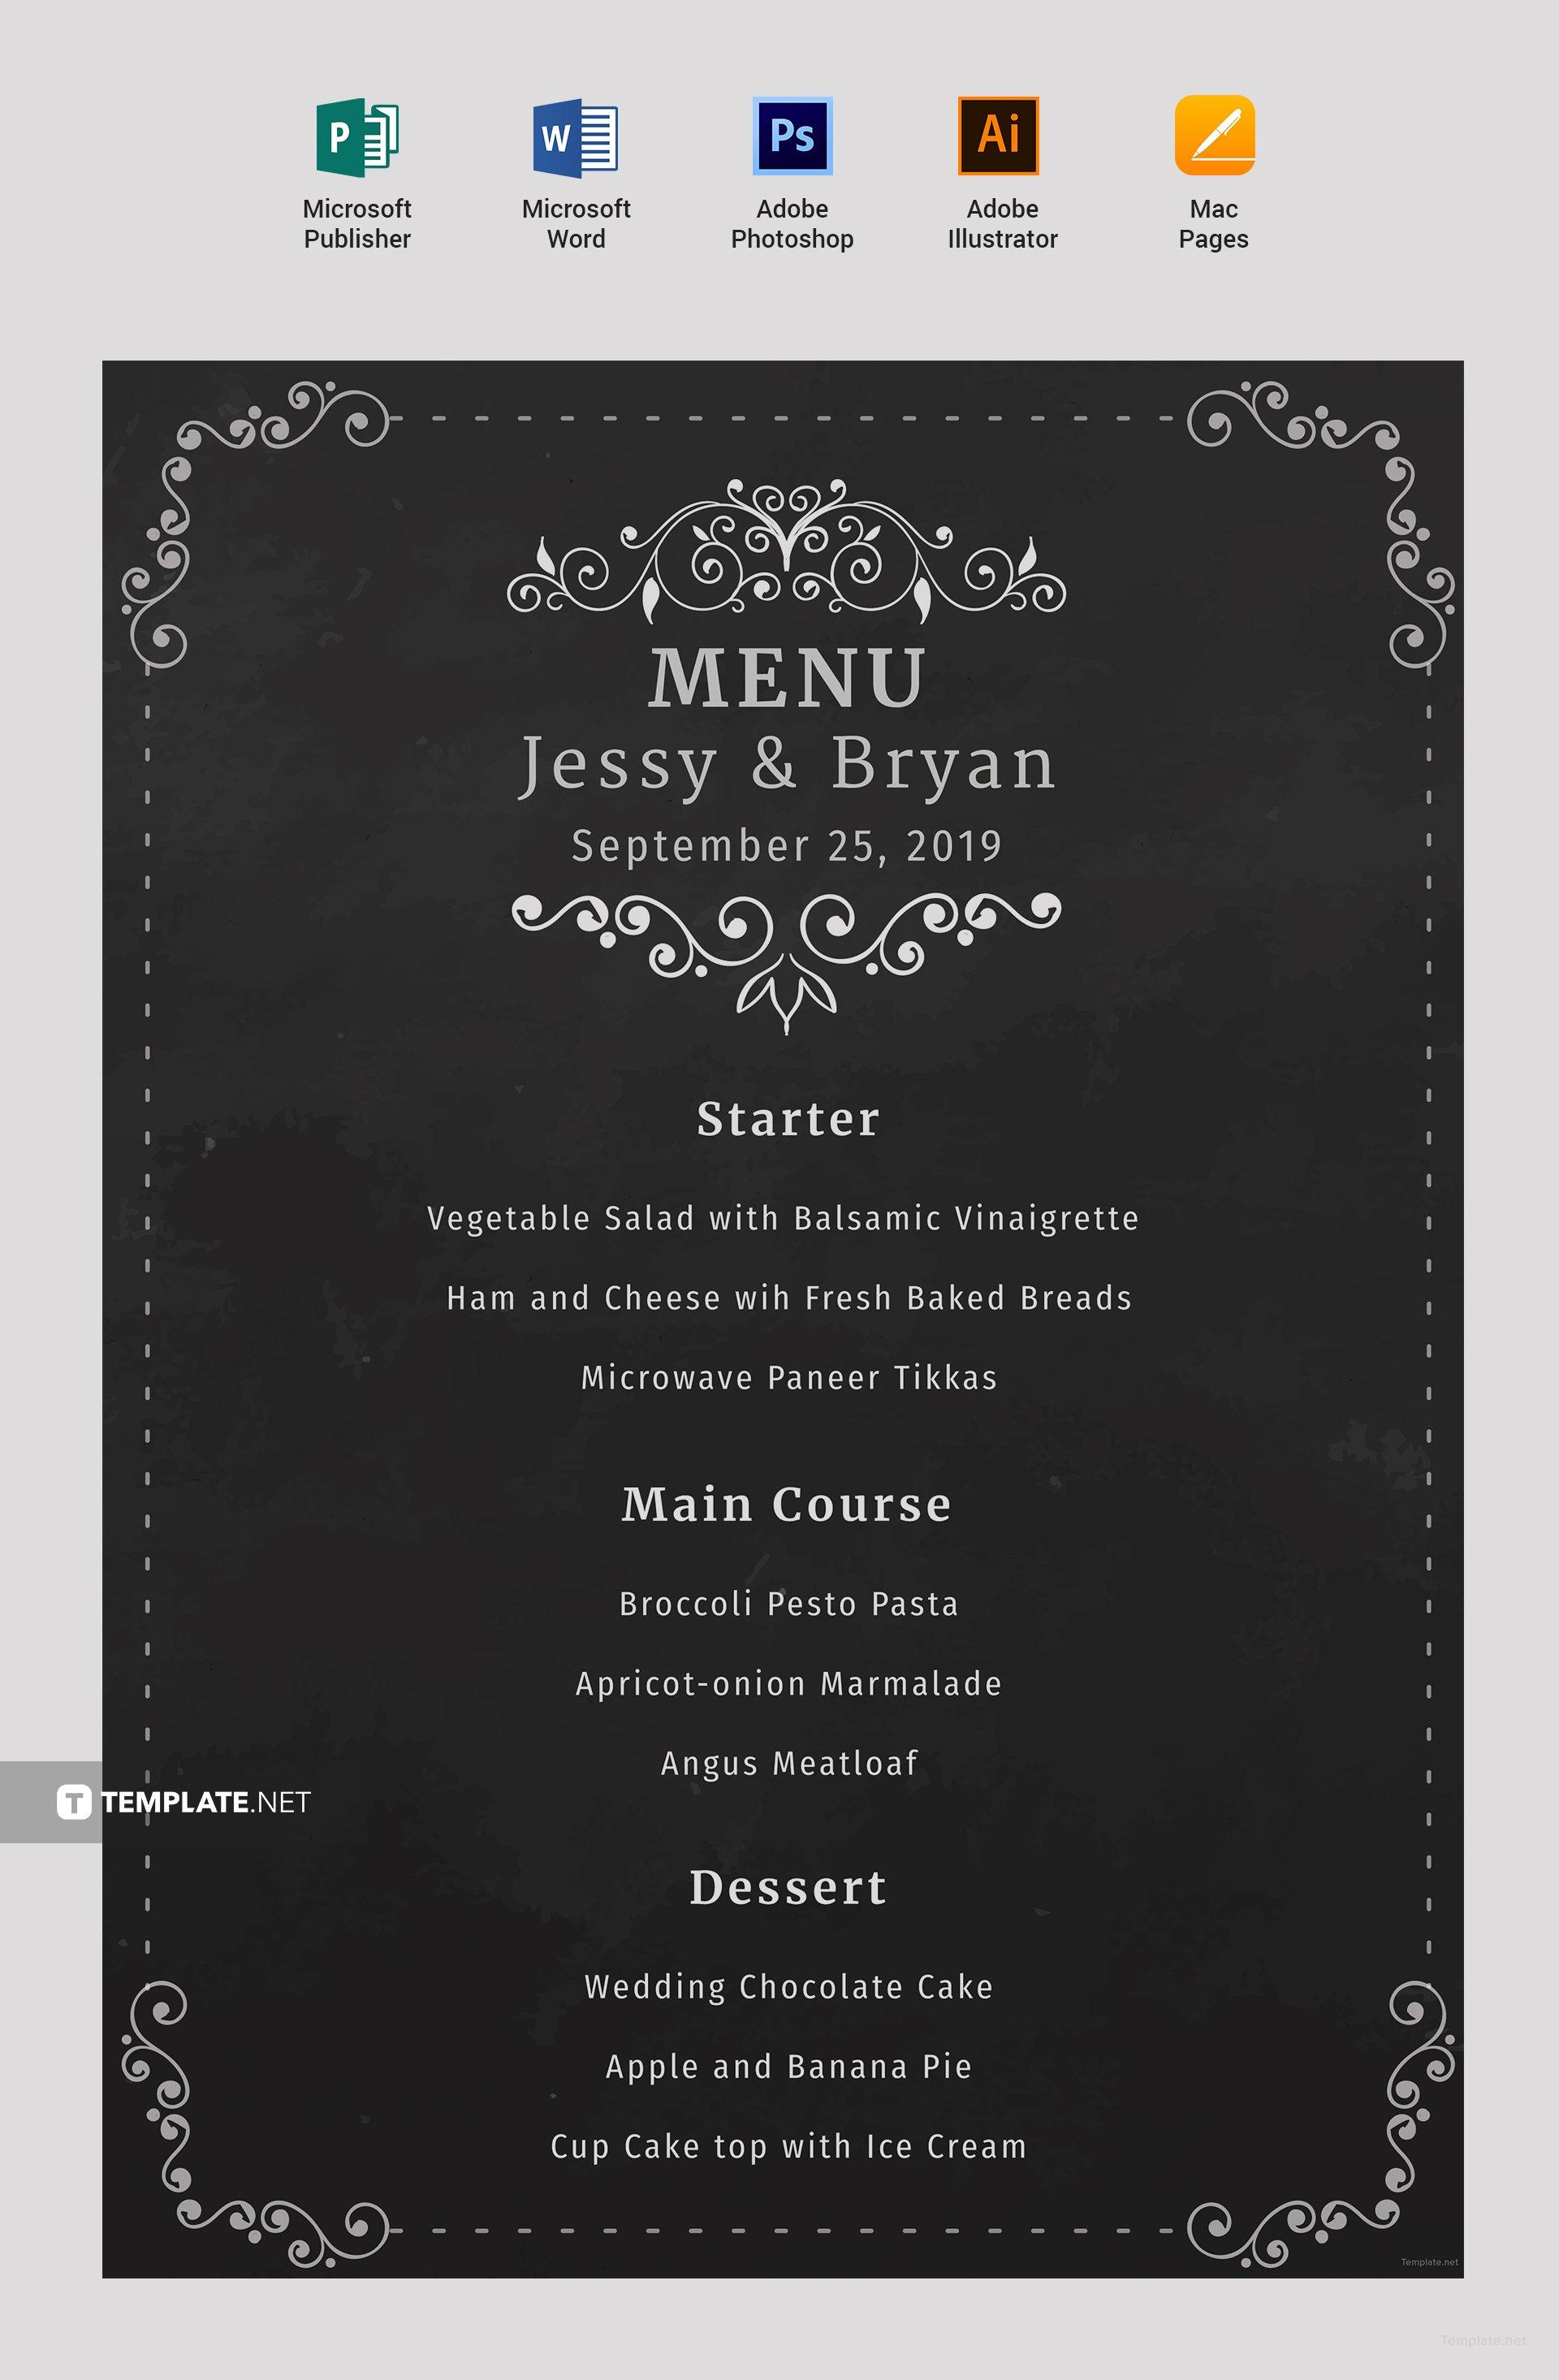 free chalkboard wedding menu template in microsoft word